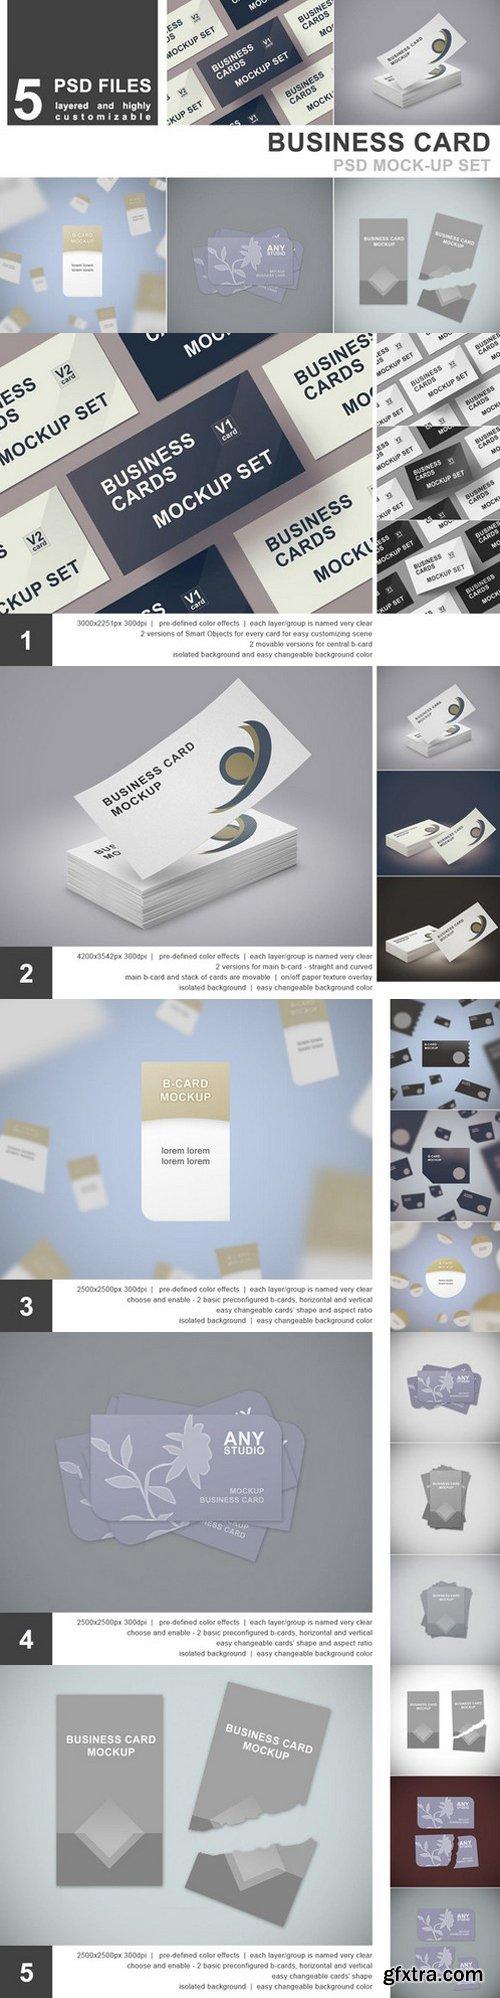 Photoshop mock ups page 464 cm business card mockup set 5 psd 511017 reheart Choice Image